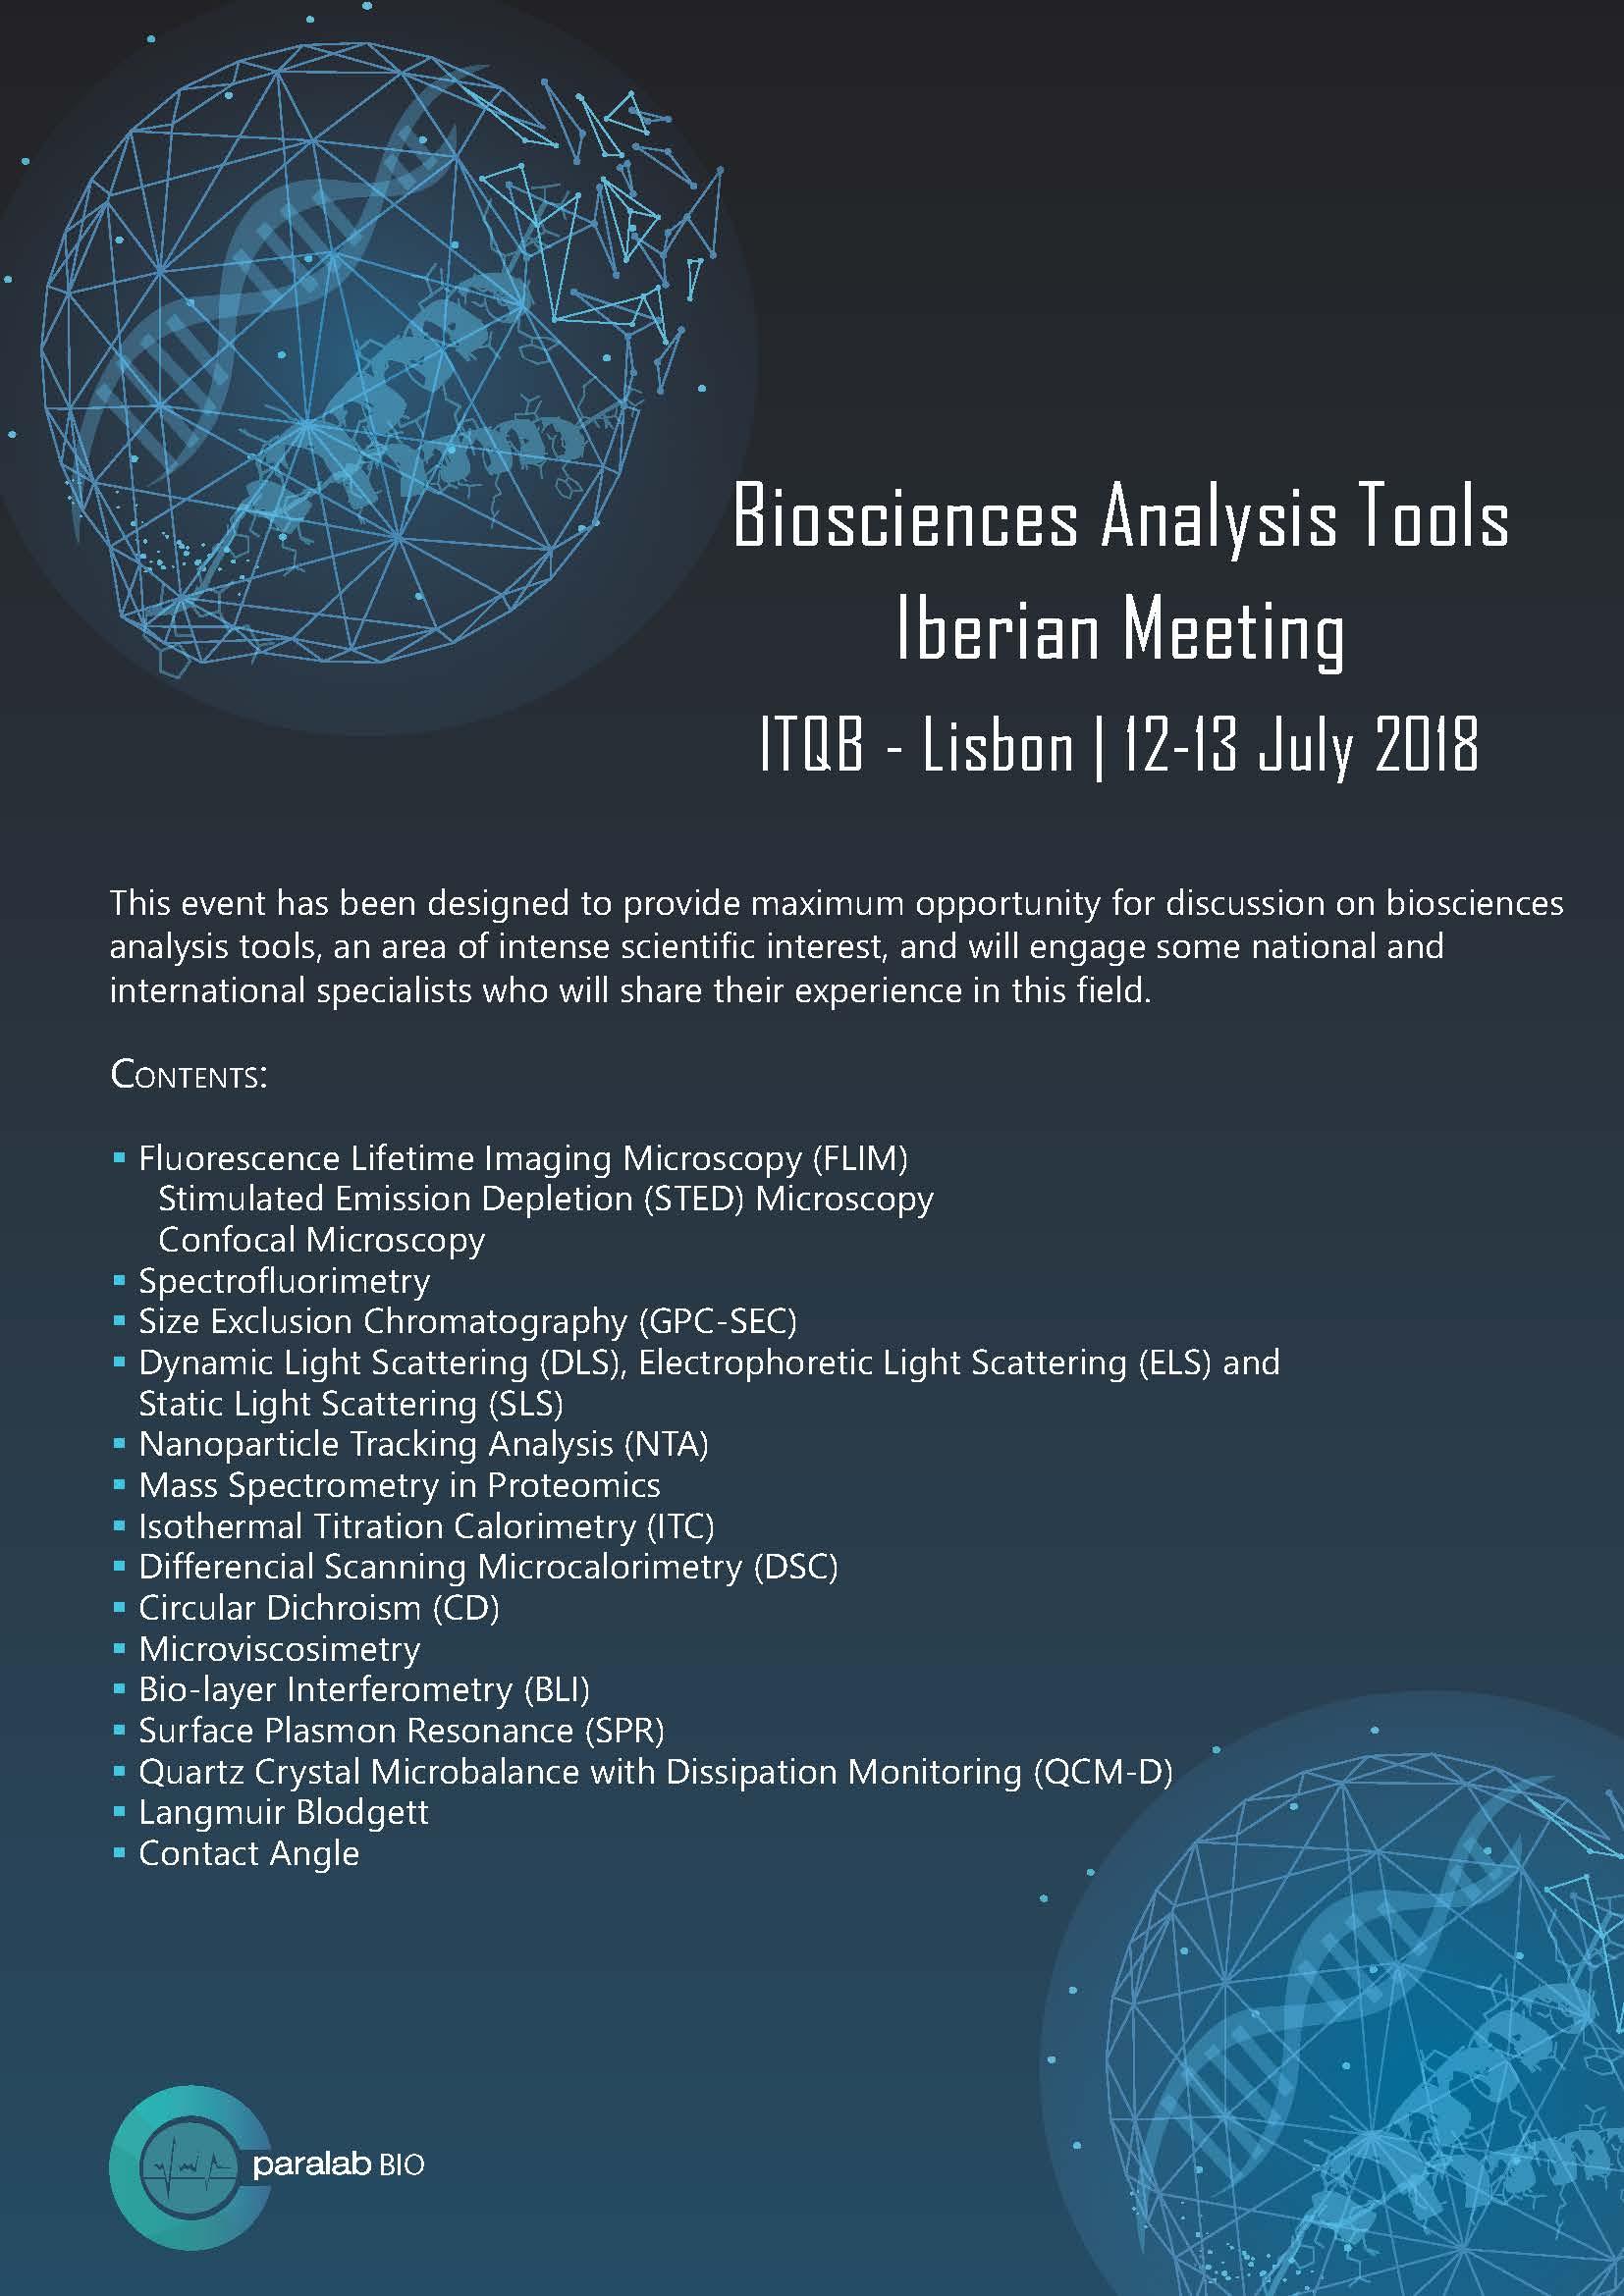 Meeting Biosciences Analysis Tools Itqb